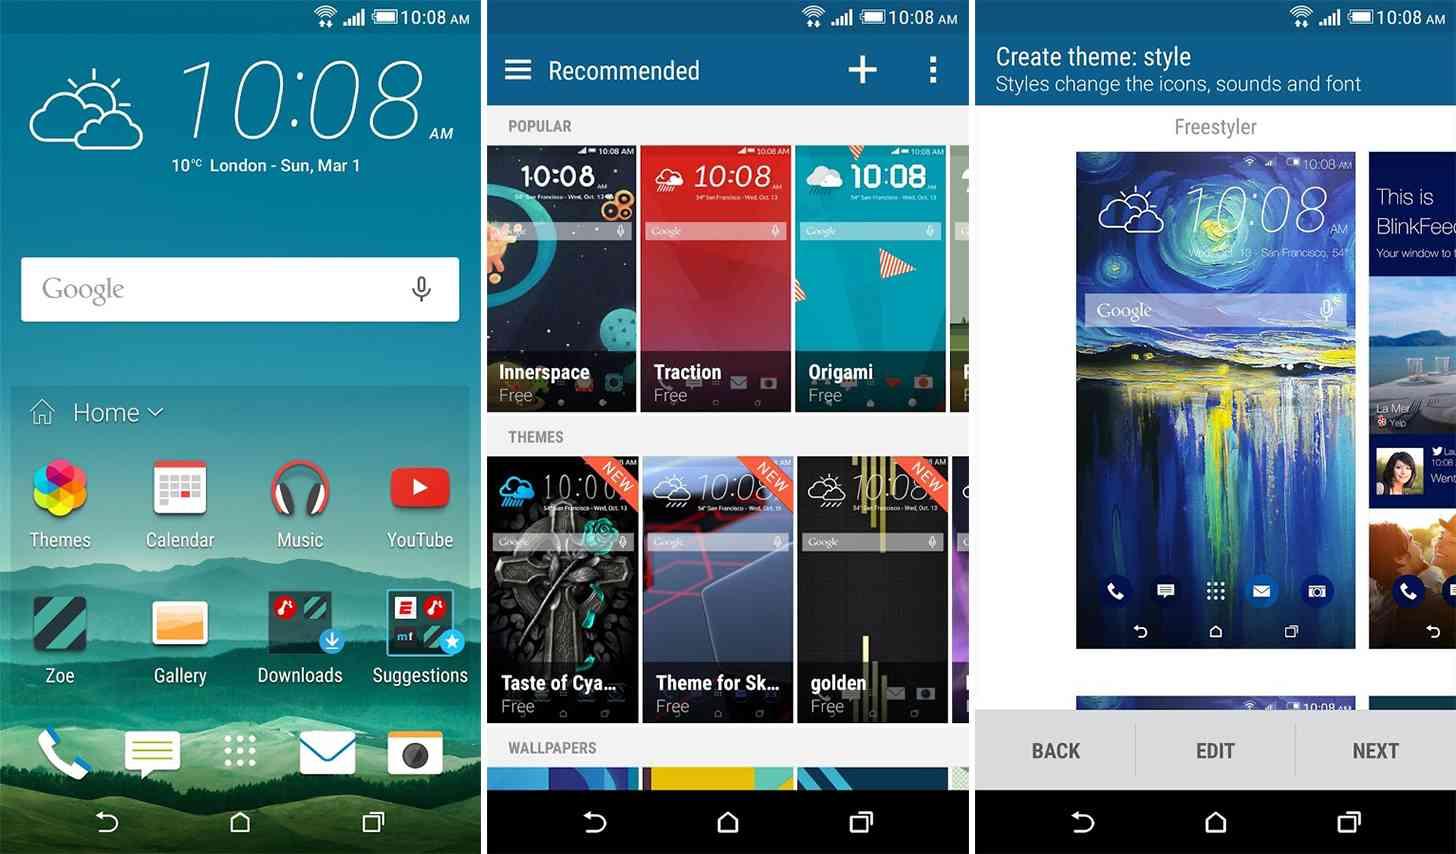 HTC Sense Home app screenshots